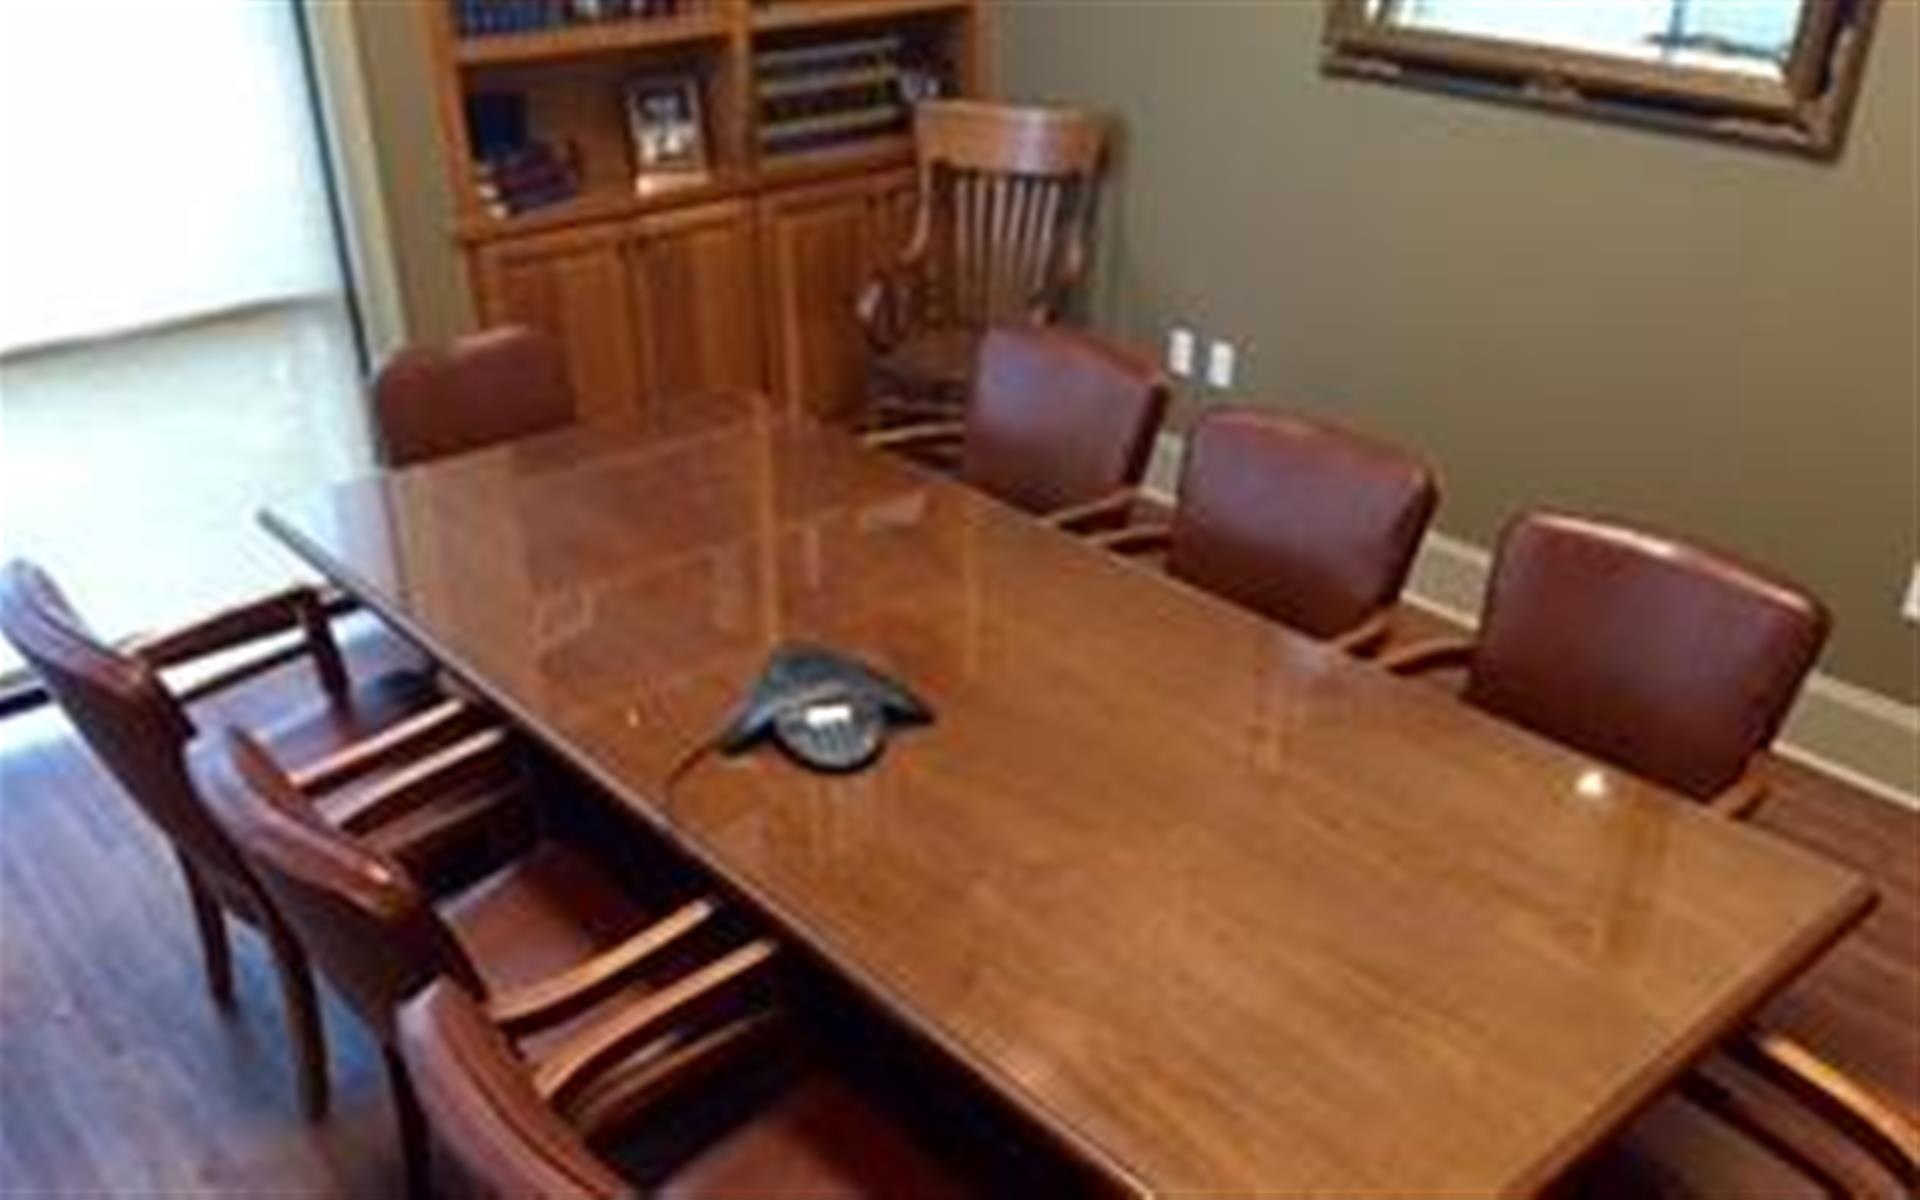 Louisiana Retailers Association - Executive Board Meeting Room for 8